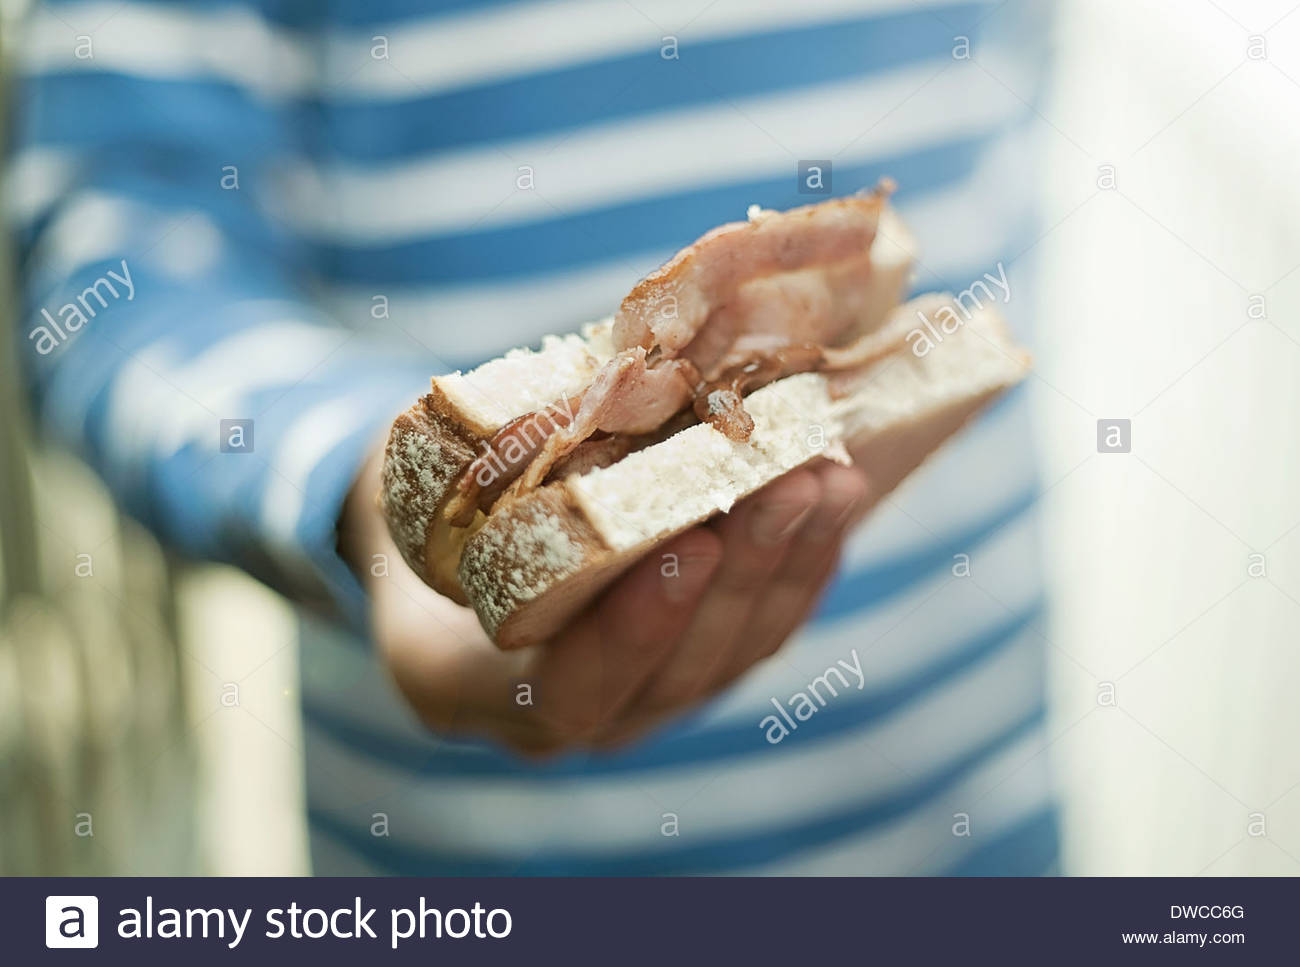 Niño sosteniendo bacon sandwich Foto de stock